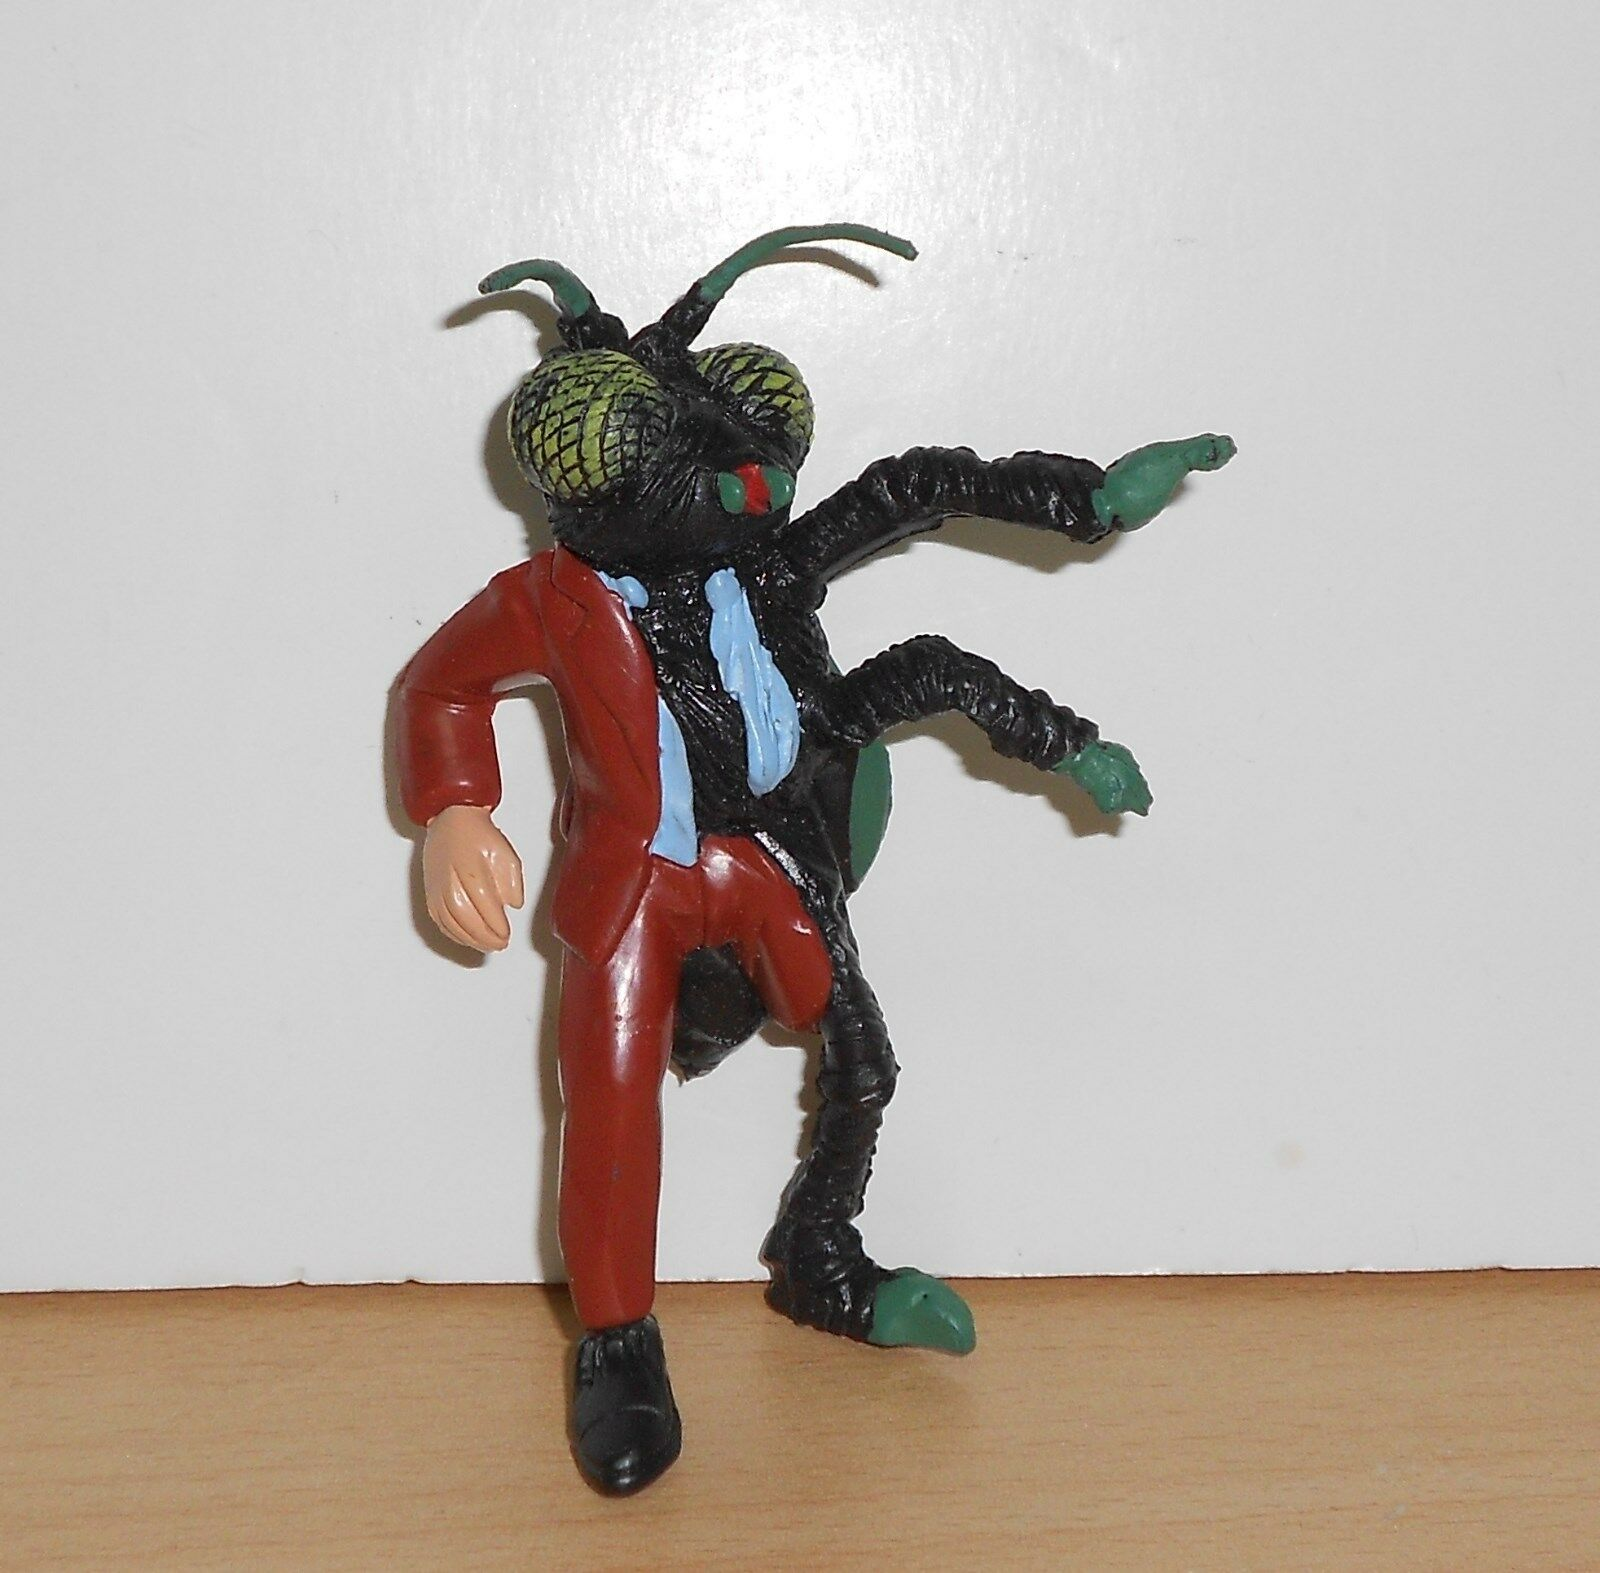 Jeff GoldBlaum THE FLY PVC FIGURINE Figure 4  Tall Hard Rubber 1992